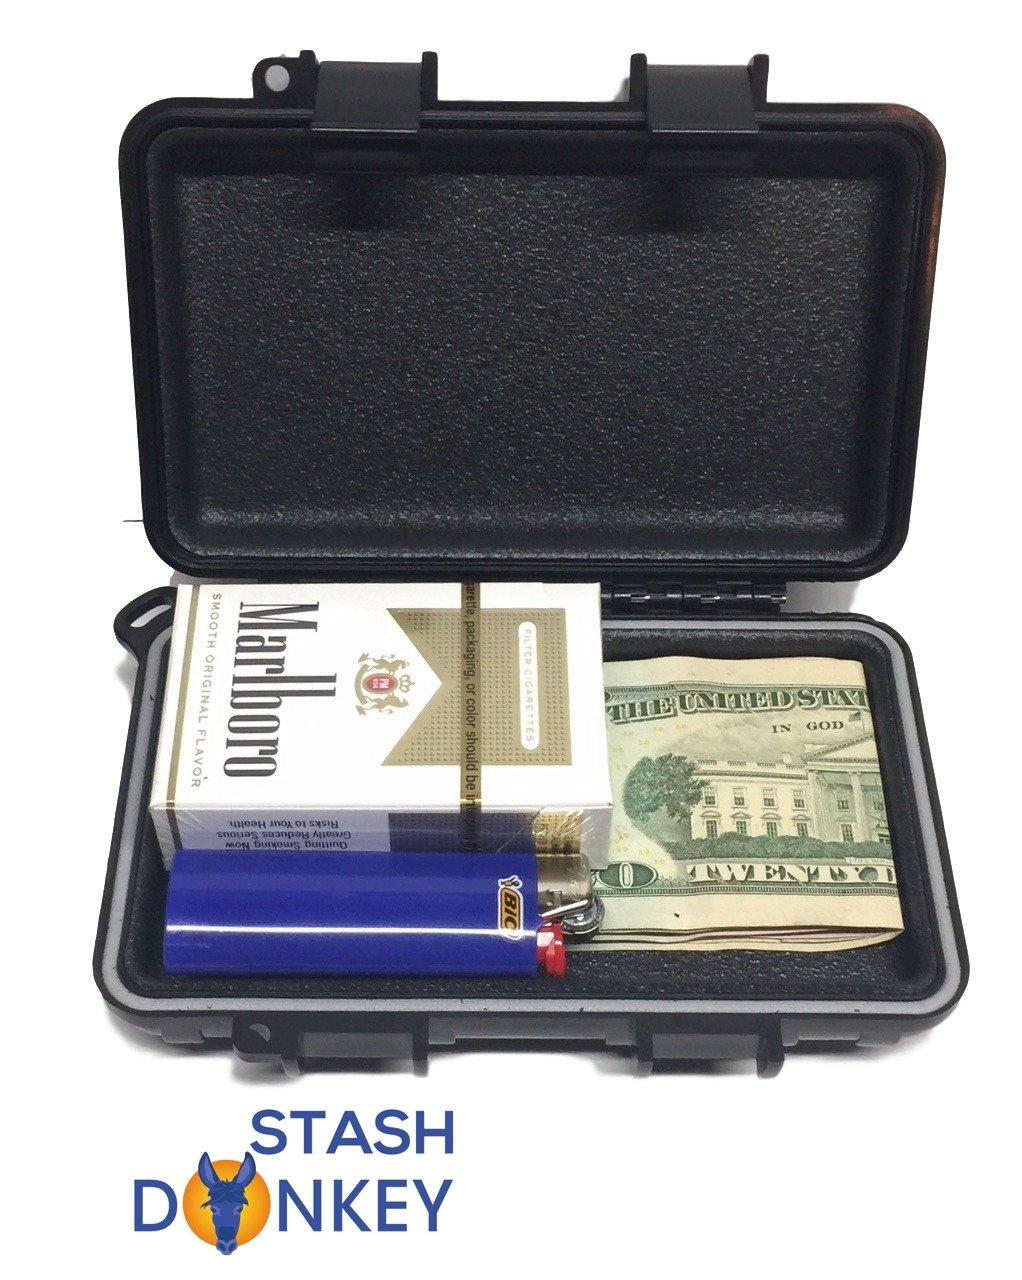 Stash Donkey Magnetic Stash Box 'Slim Dog' Waterproof and Smellproof